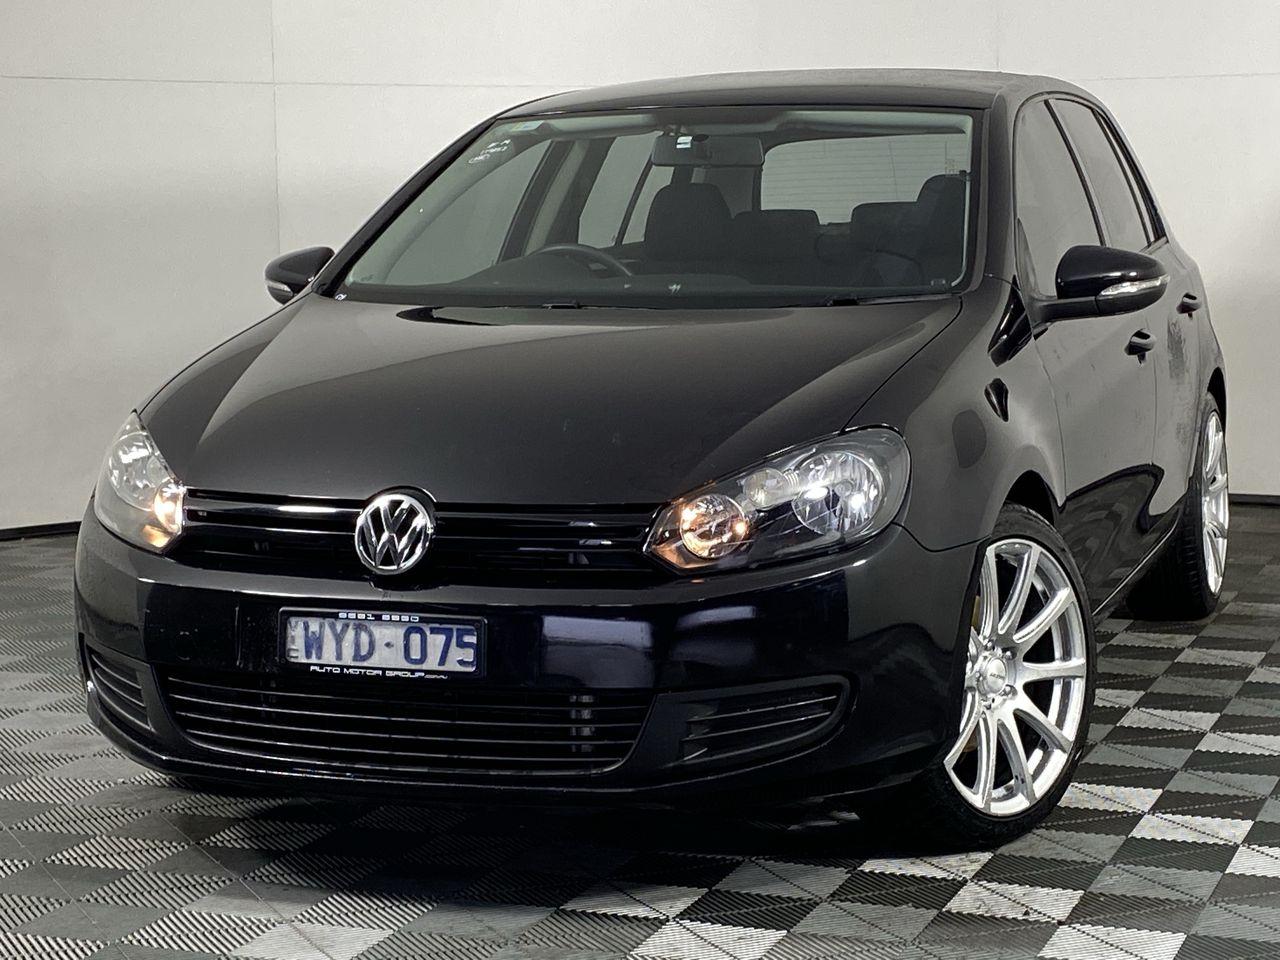 2009 Volkswagen Golf Manual Hatchback